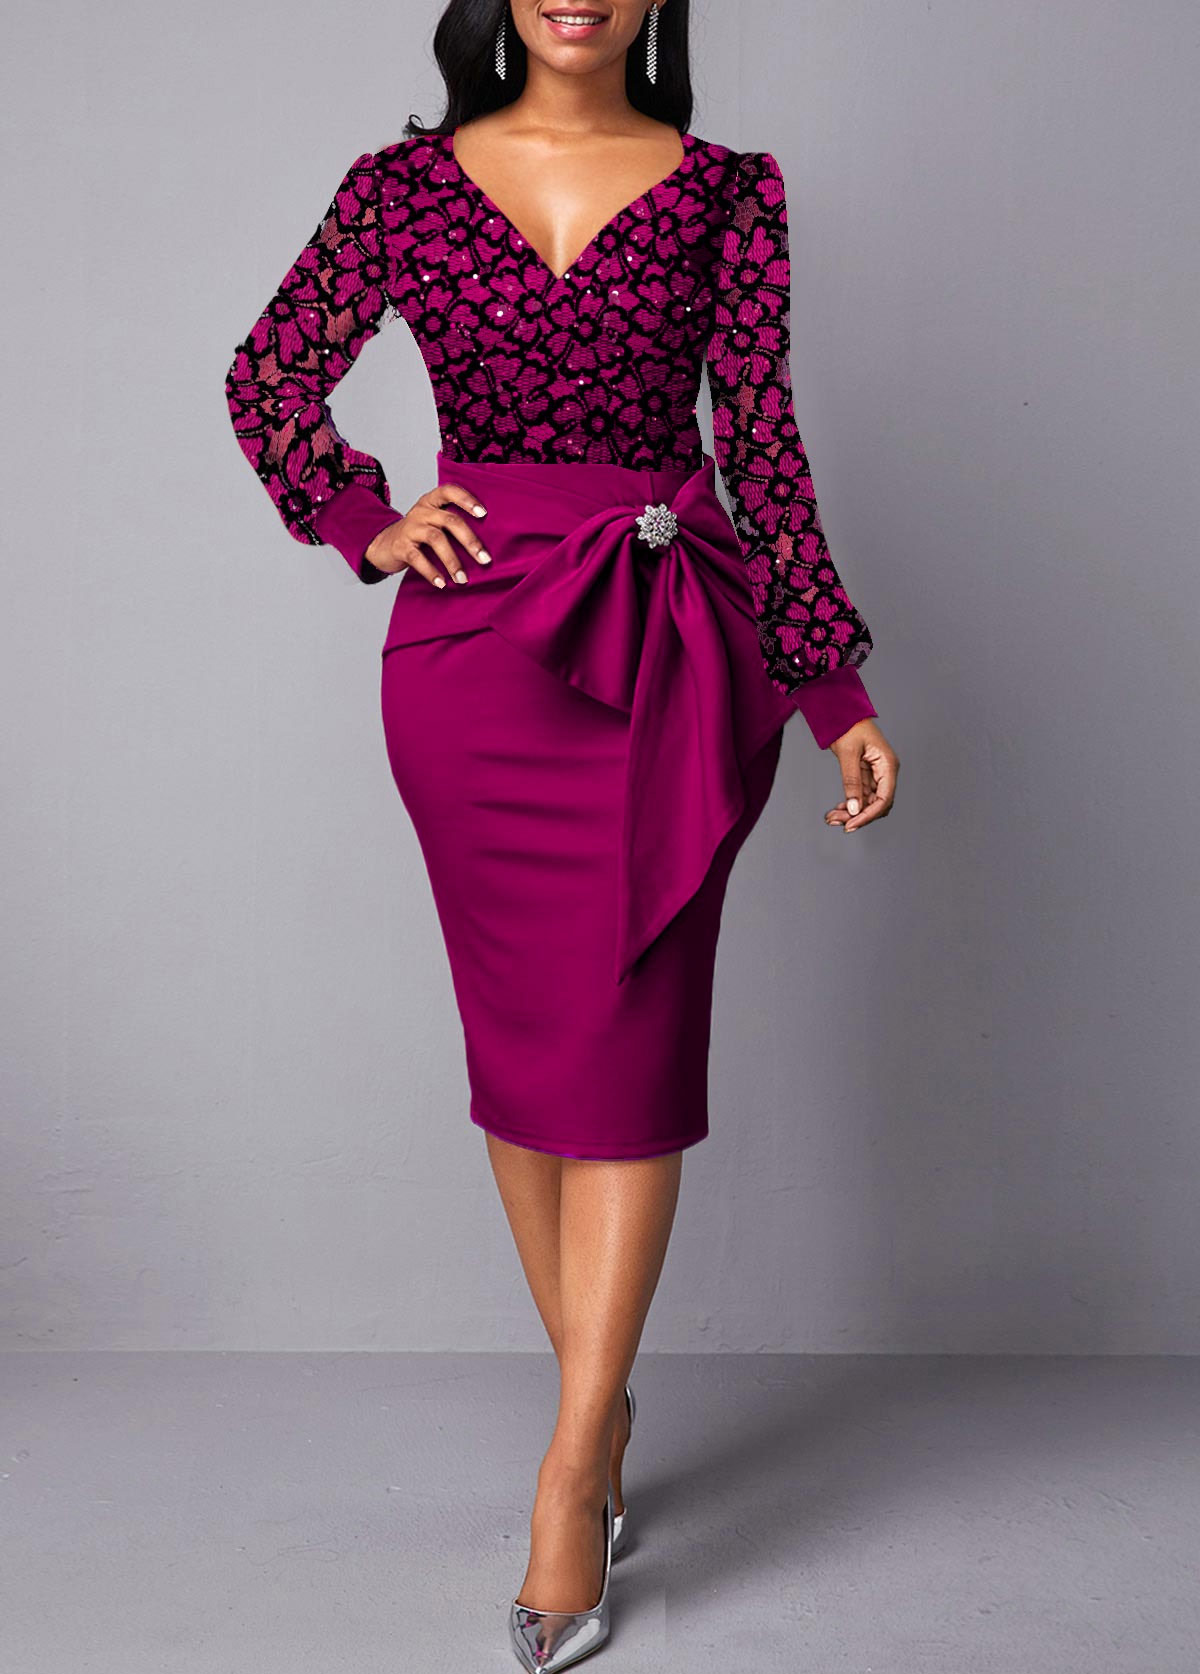 Bowknot Detail Lace Panel Back Slit Dress